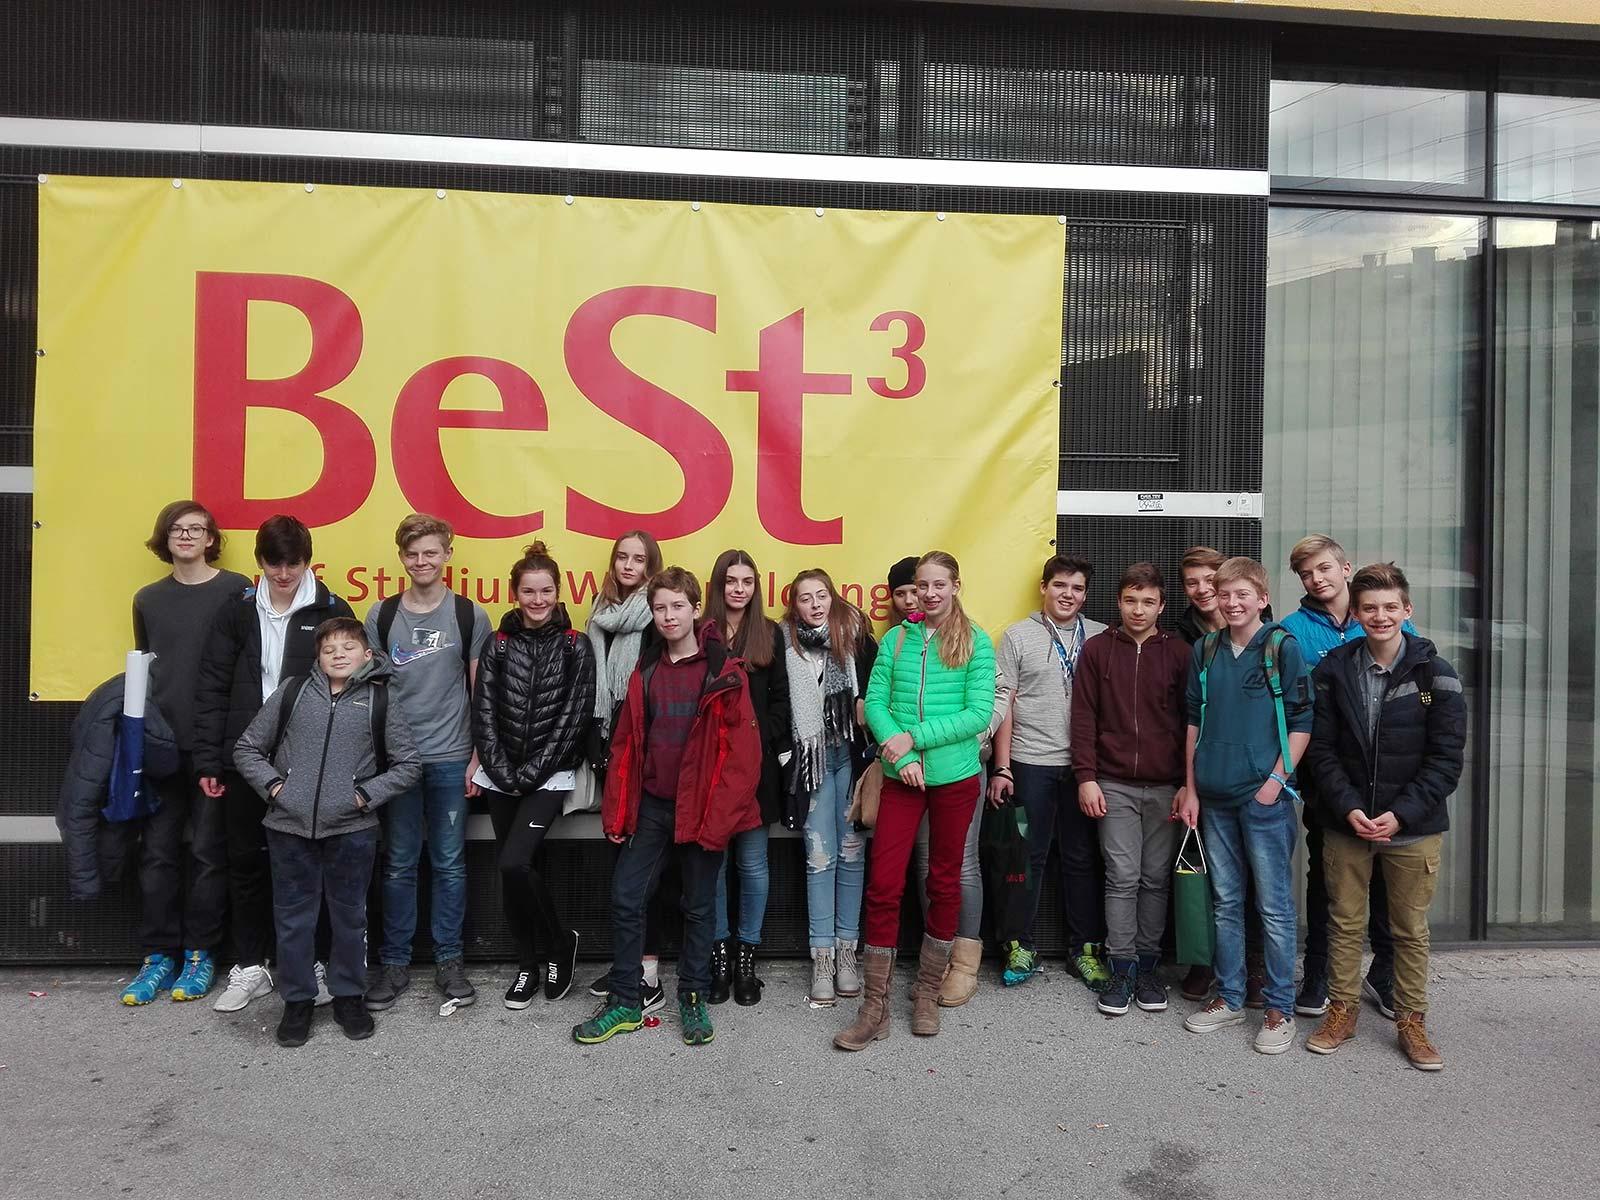 Bildungsberatung, BeSt Bildungsmesse | BRG Wörgl